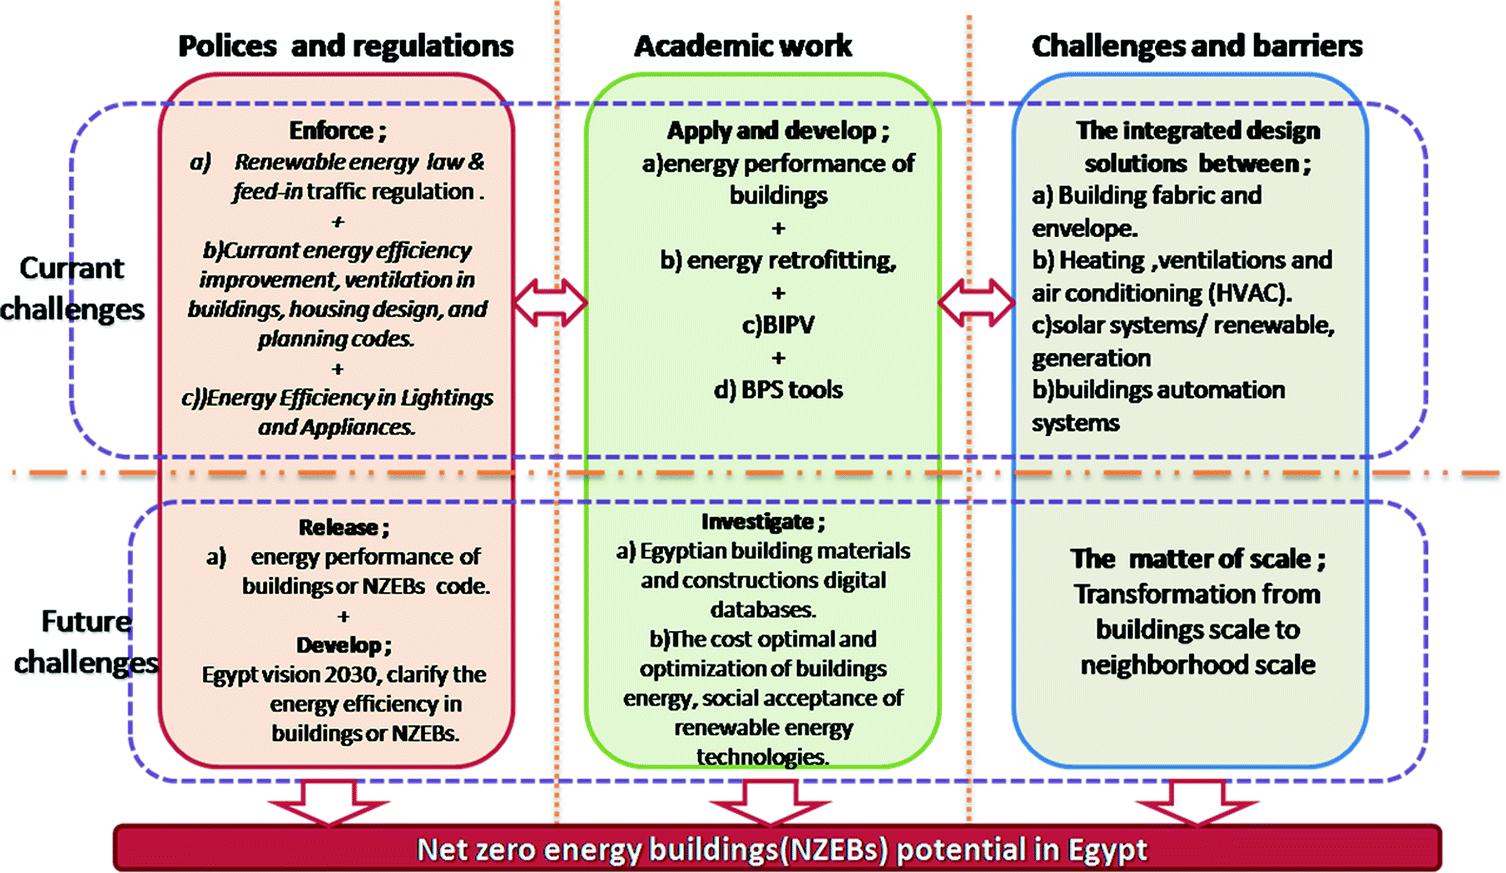 Net Zero Energy Buildings (NZEBs) Potential in MENA Region